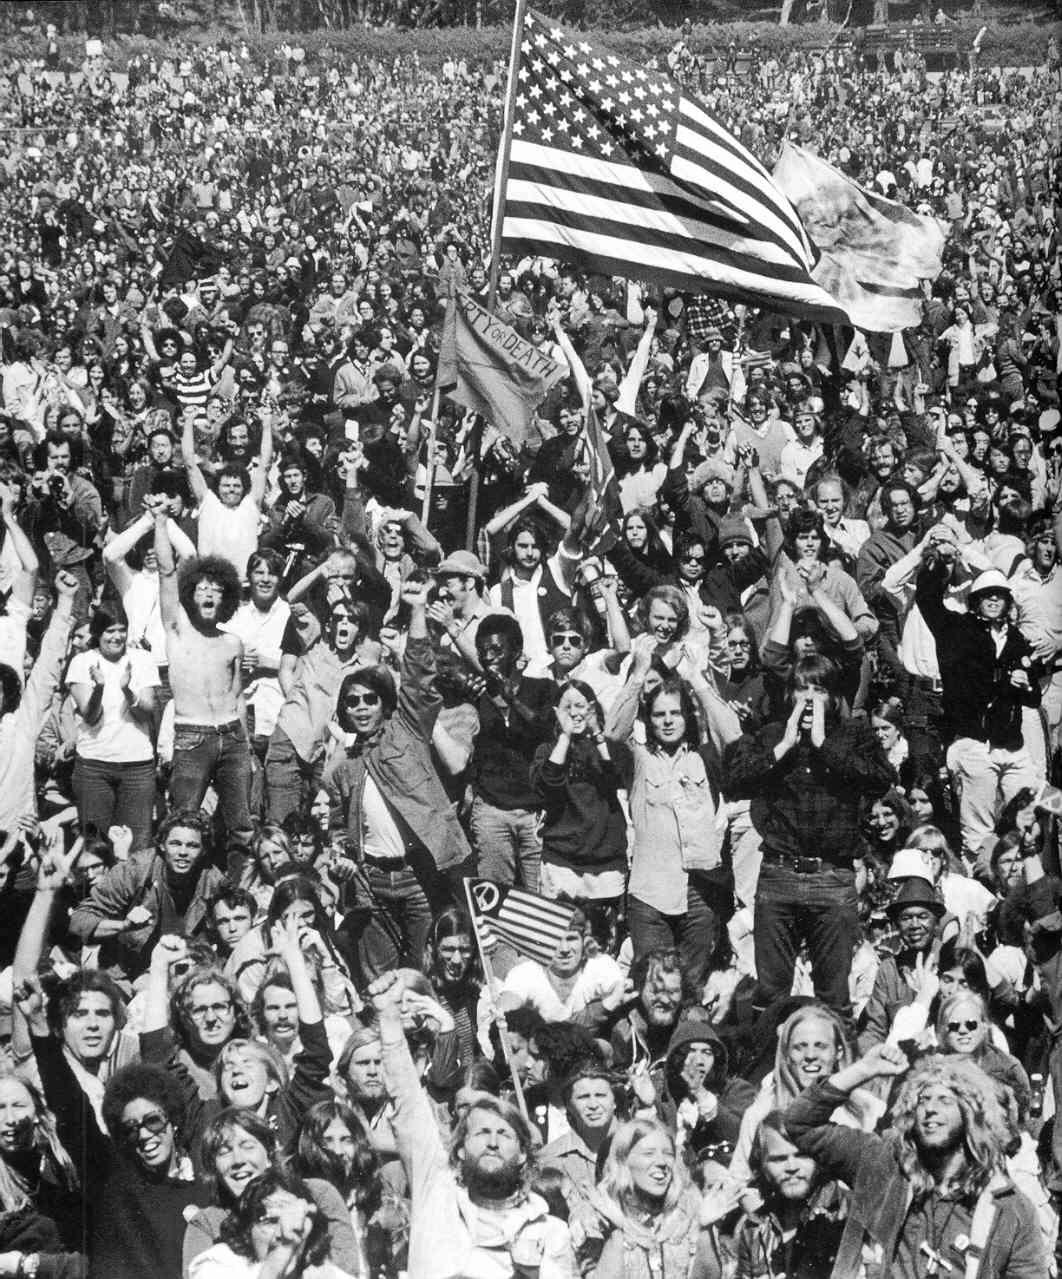 Hey Hey Lbj How Many Kids Did You Kill Today An Anti War Protest In San Francisco 1968 Vietnam Protests Anti War Vietnam War